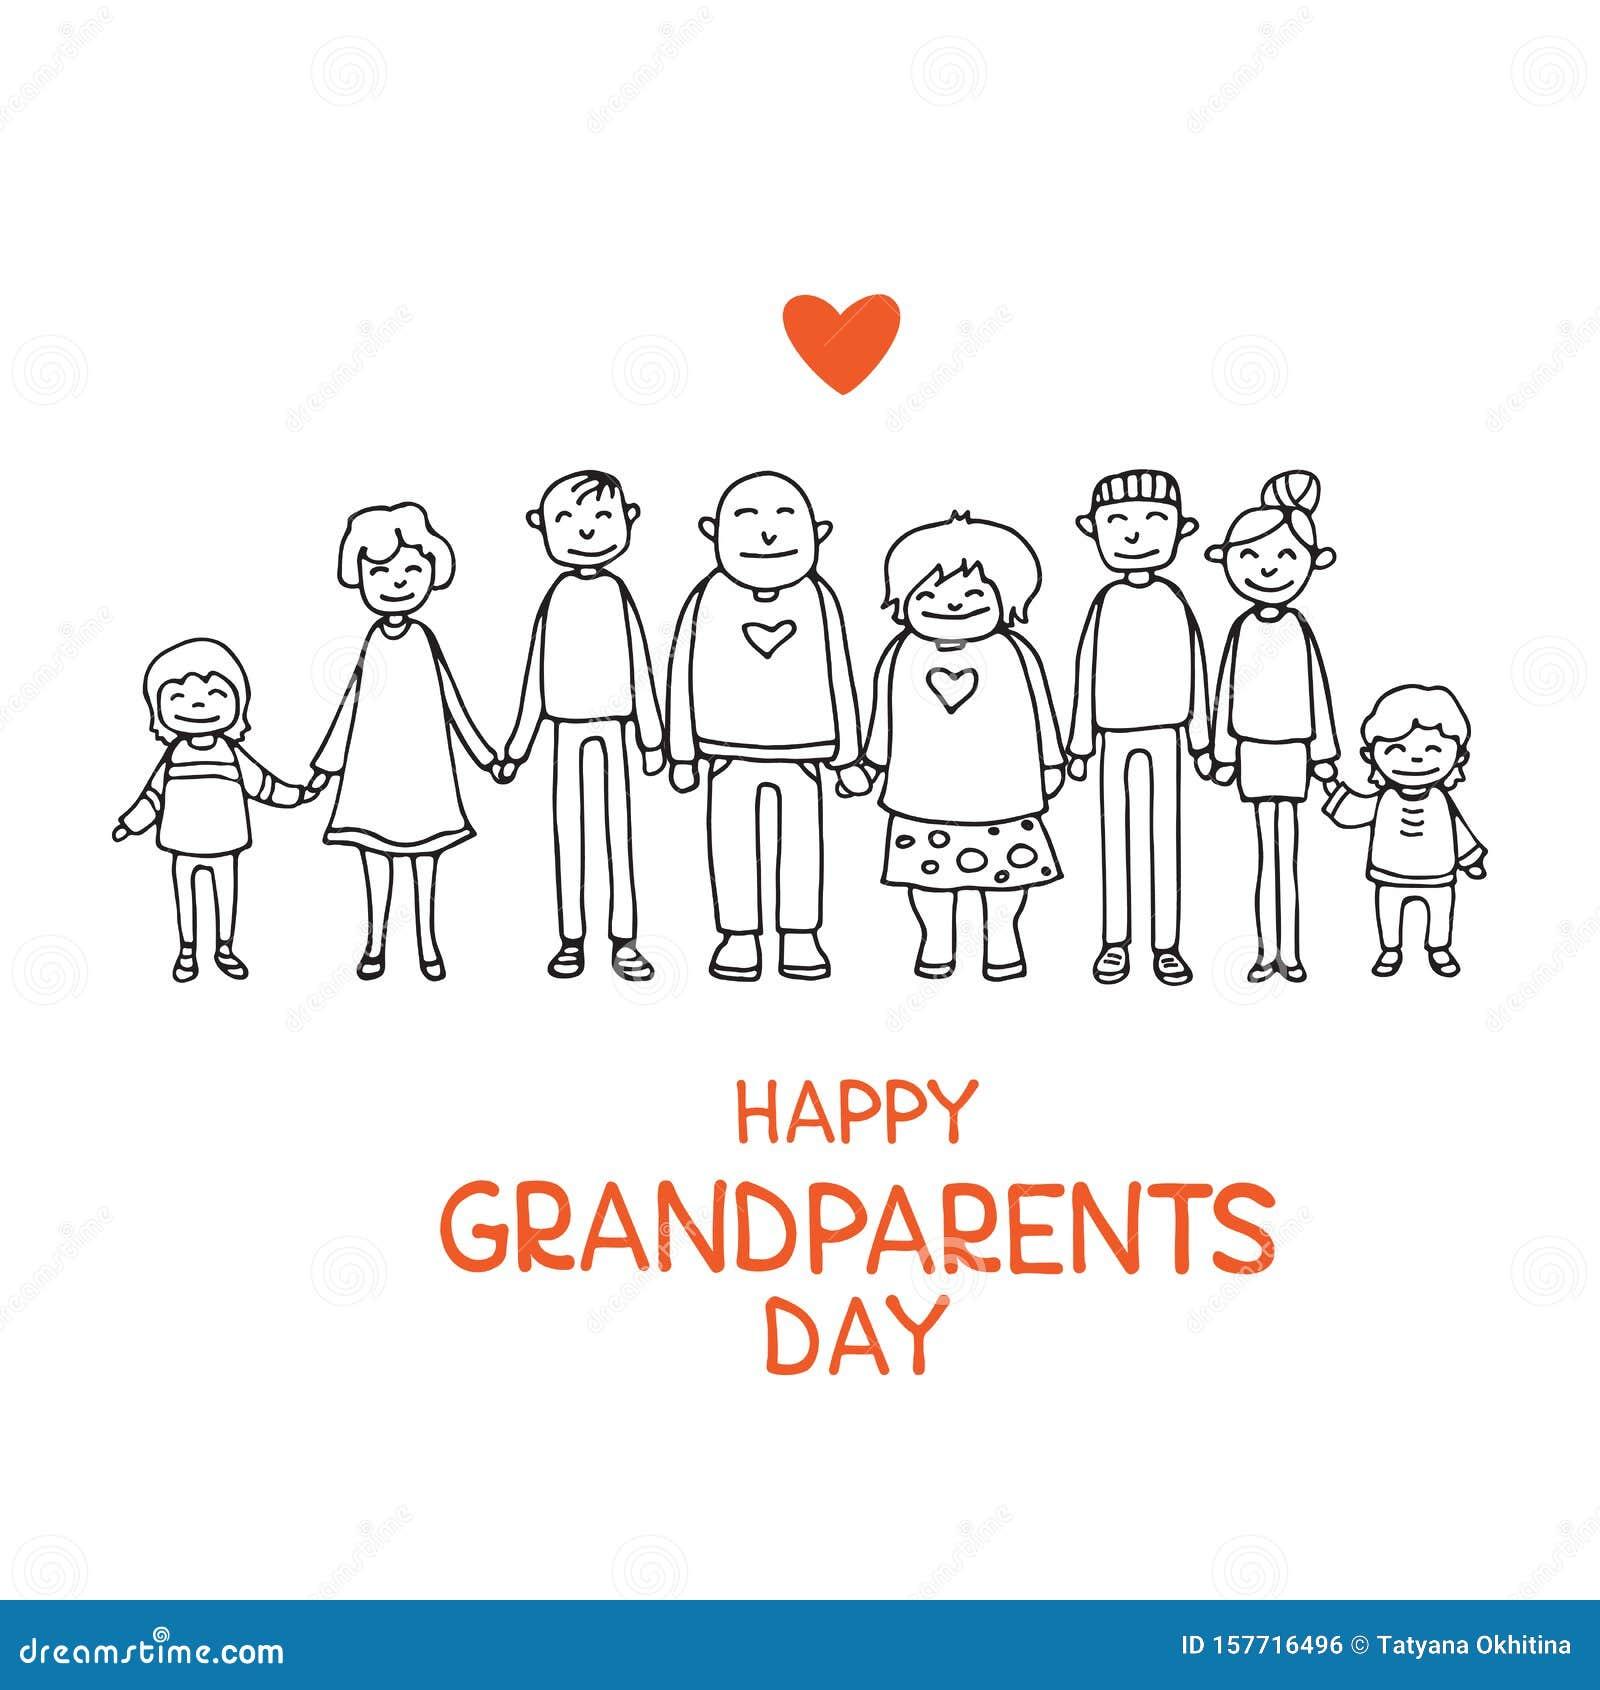 Grandparents day-06